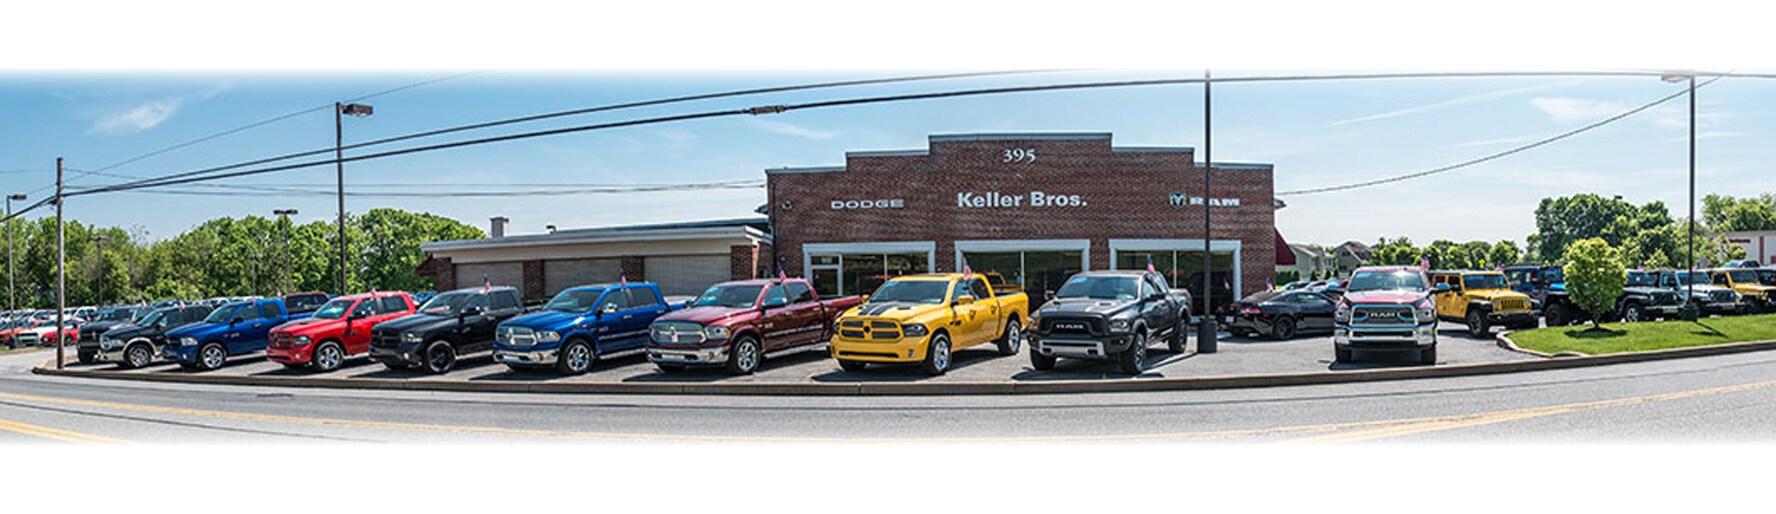 htm vehicles touring mazda grand in for mechanicsburg dealership pre sedan sale featured pa harrisburg owned freysinger